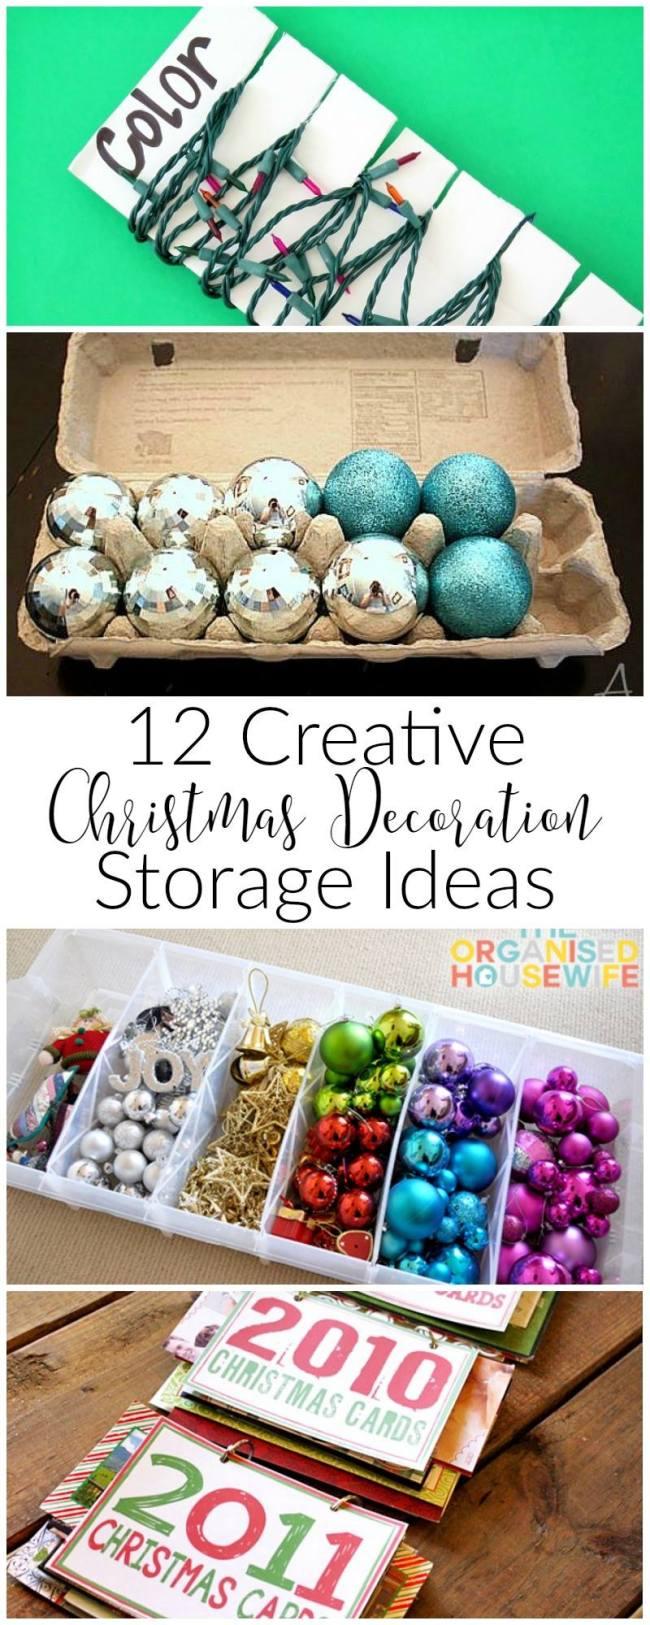 creative-christmas-decoration-storage-ideas